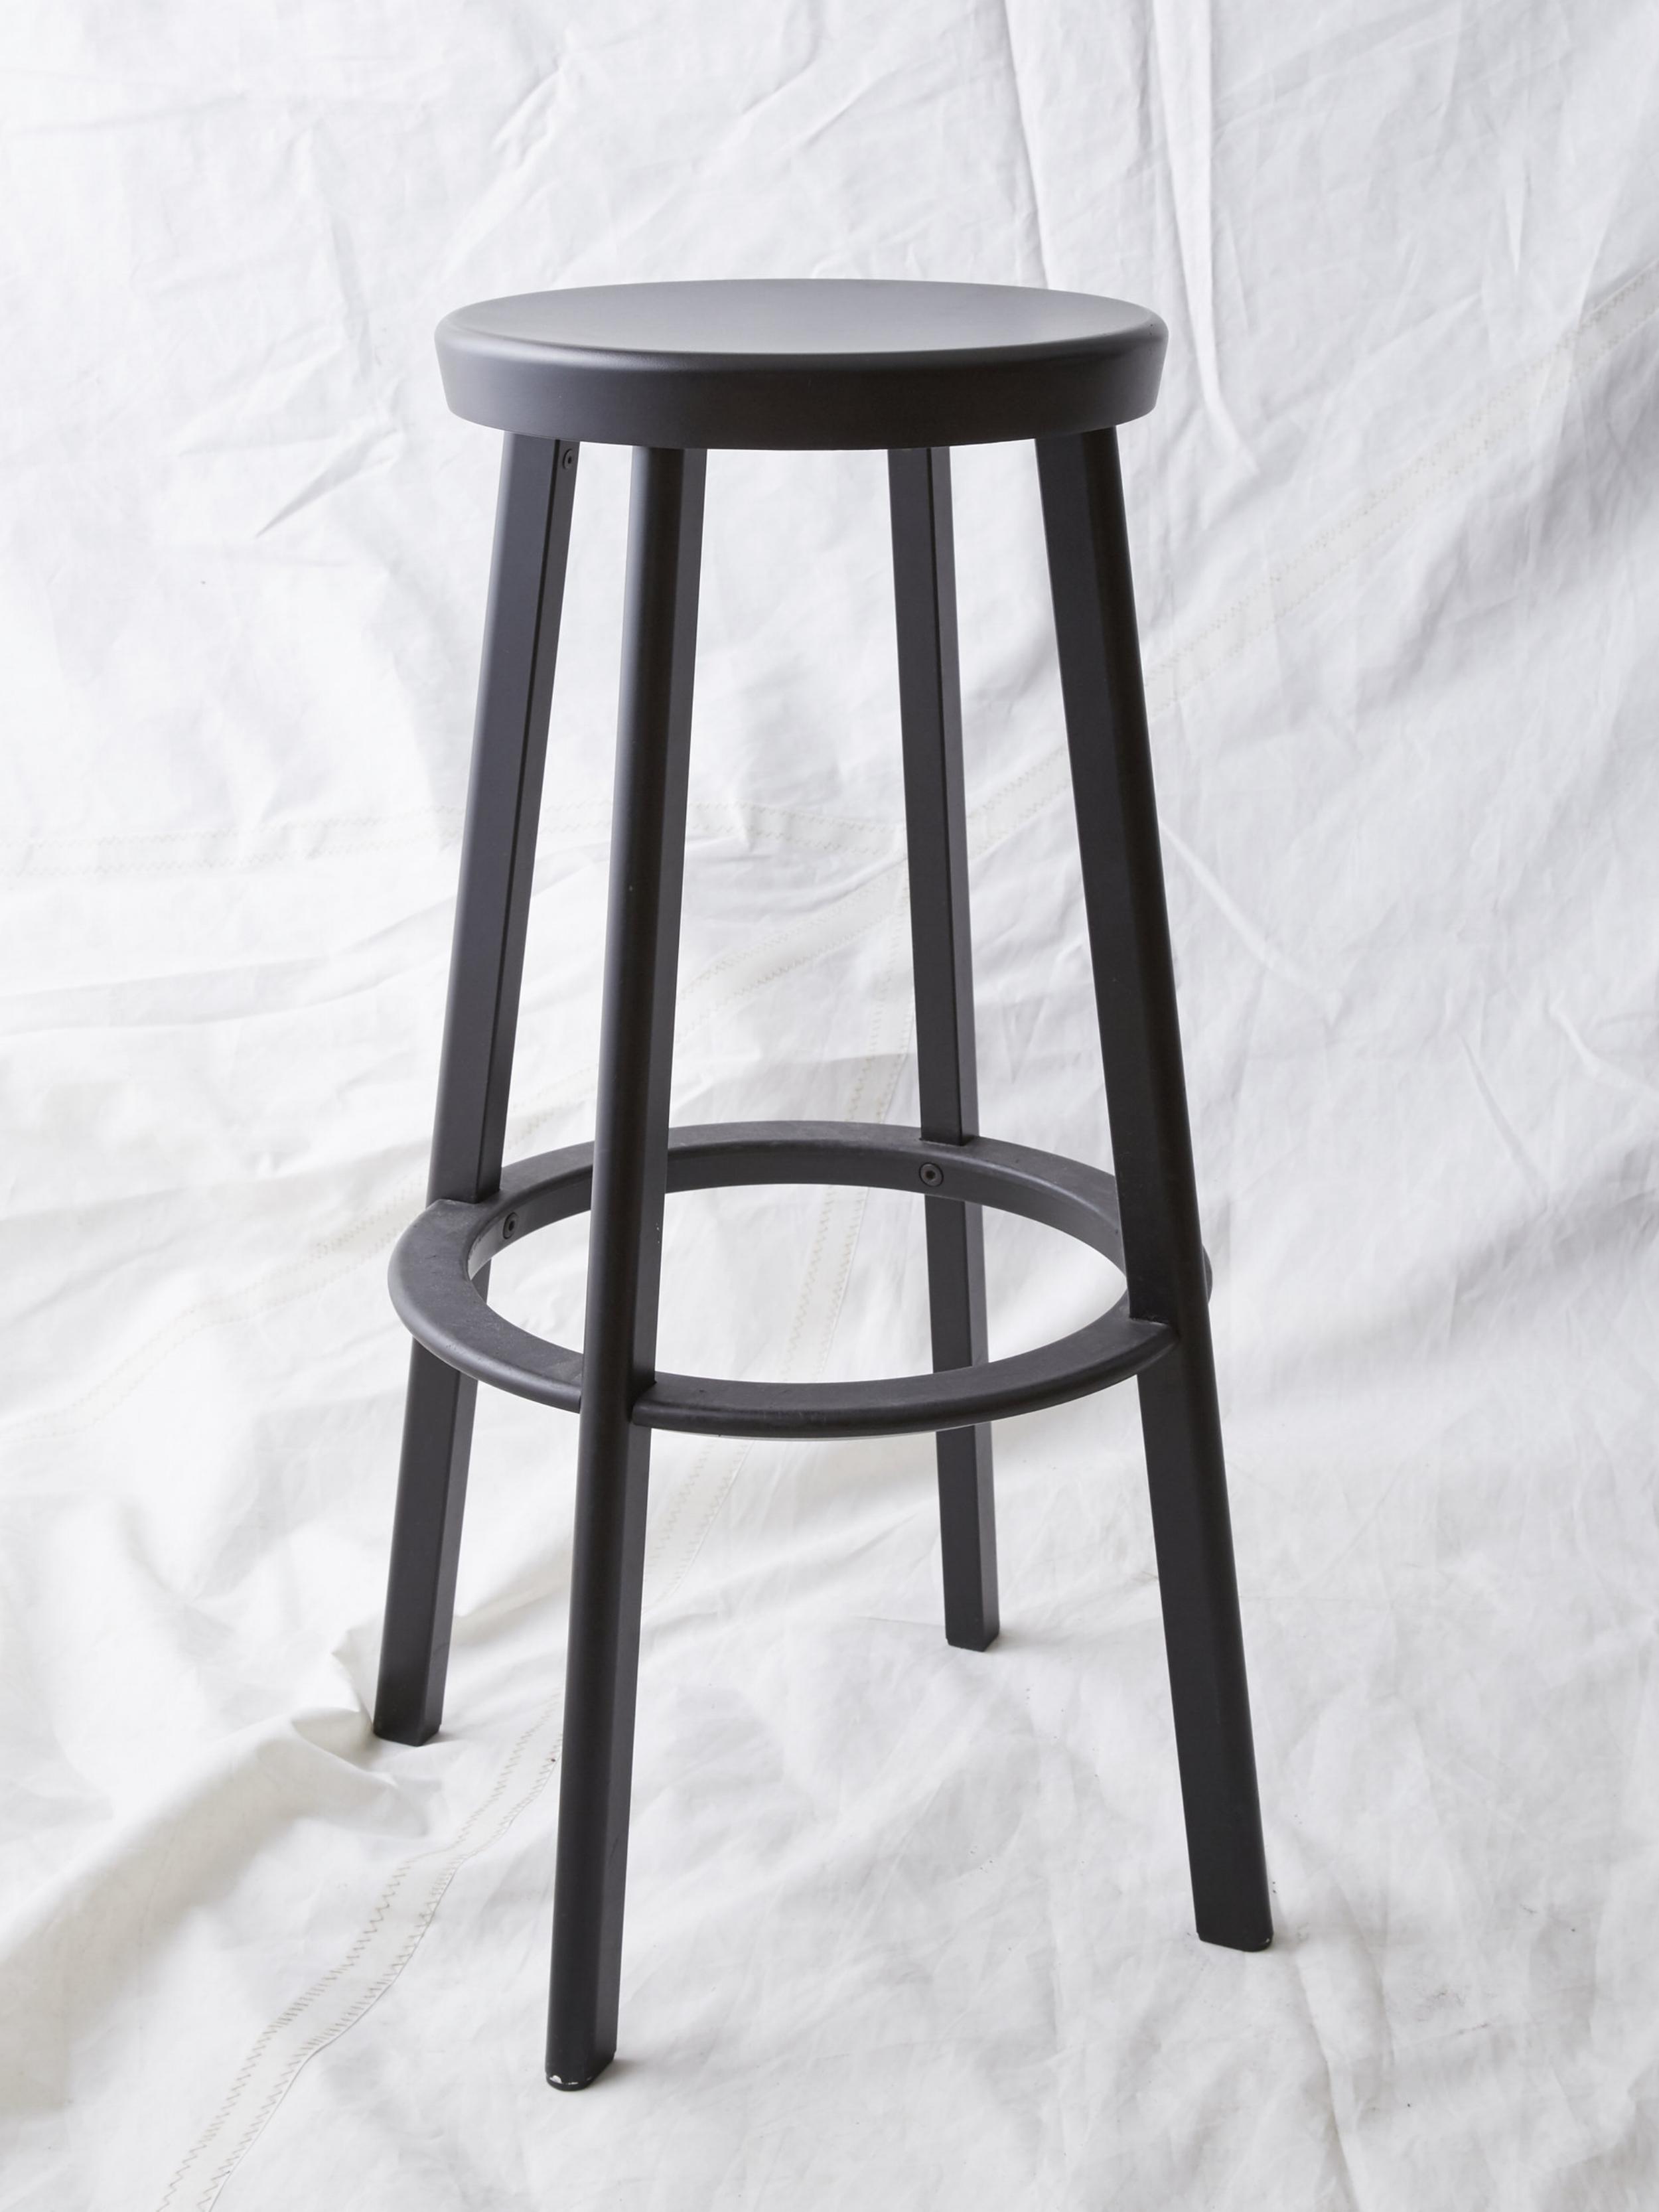 "ST027  DEJA-VU BLACK ALUMINUM STOOL BY NAOTO FUKASAWA 13"" DIA x 30"" H  $125/week"